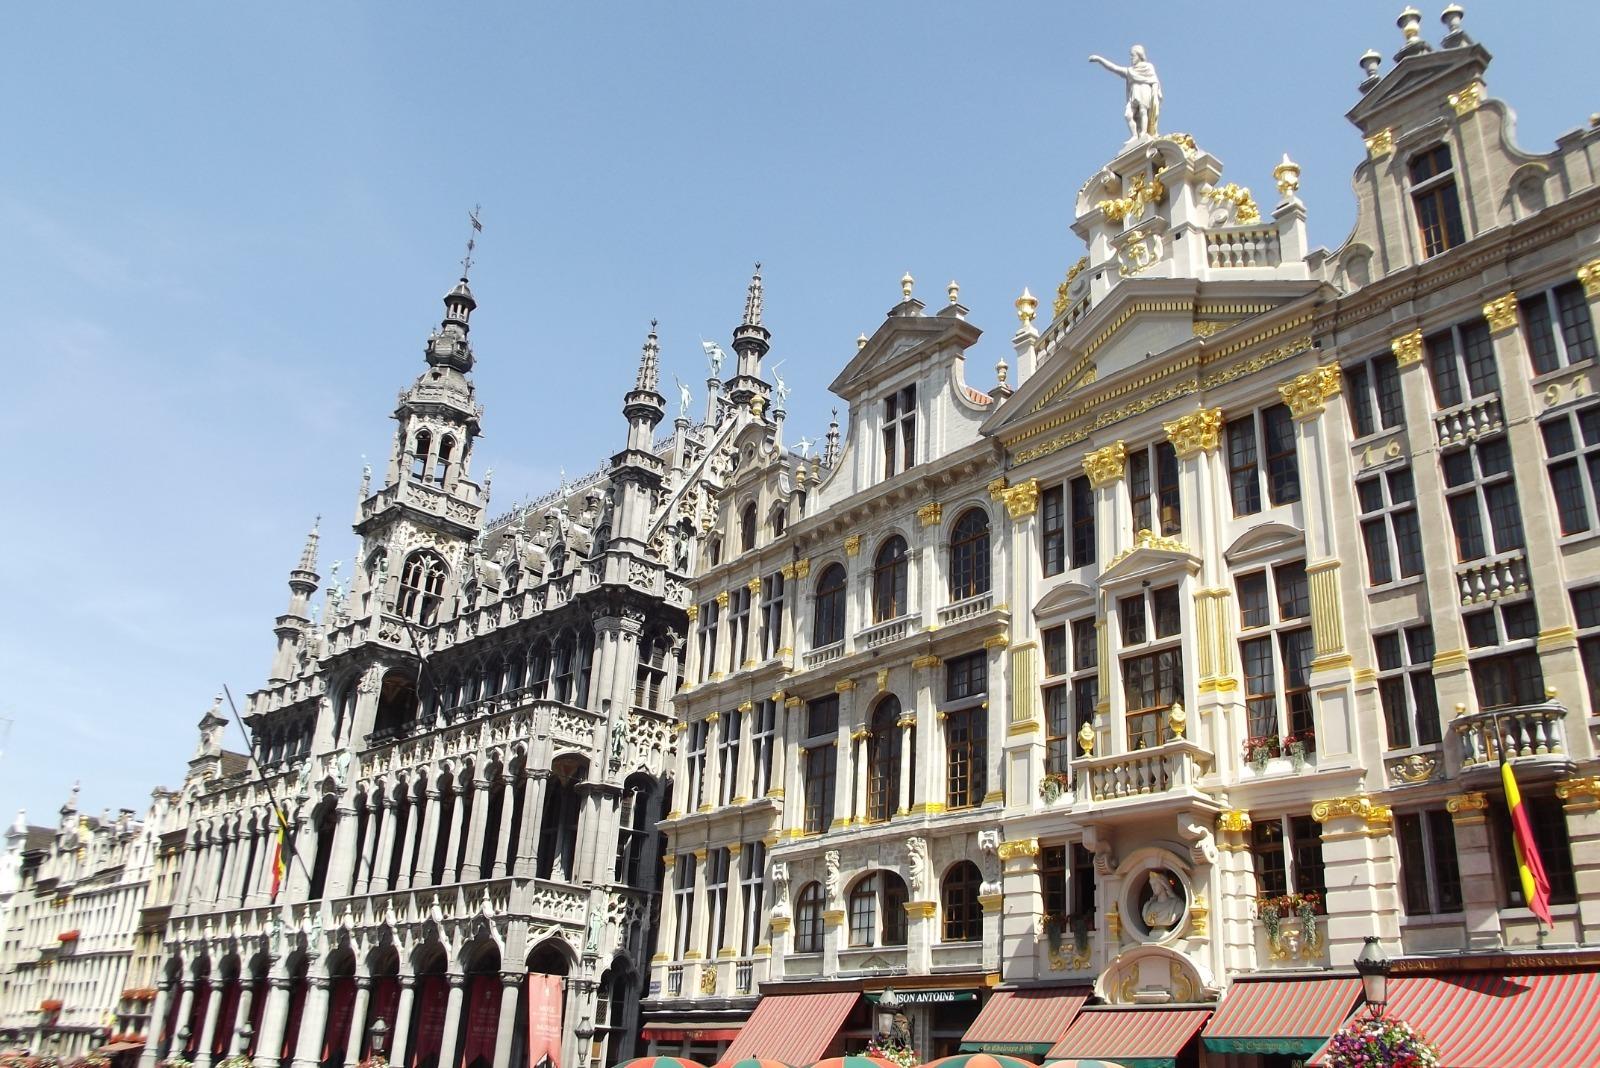 belgioelussemburgo11-1600418701.jpg